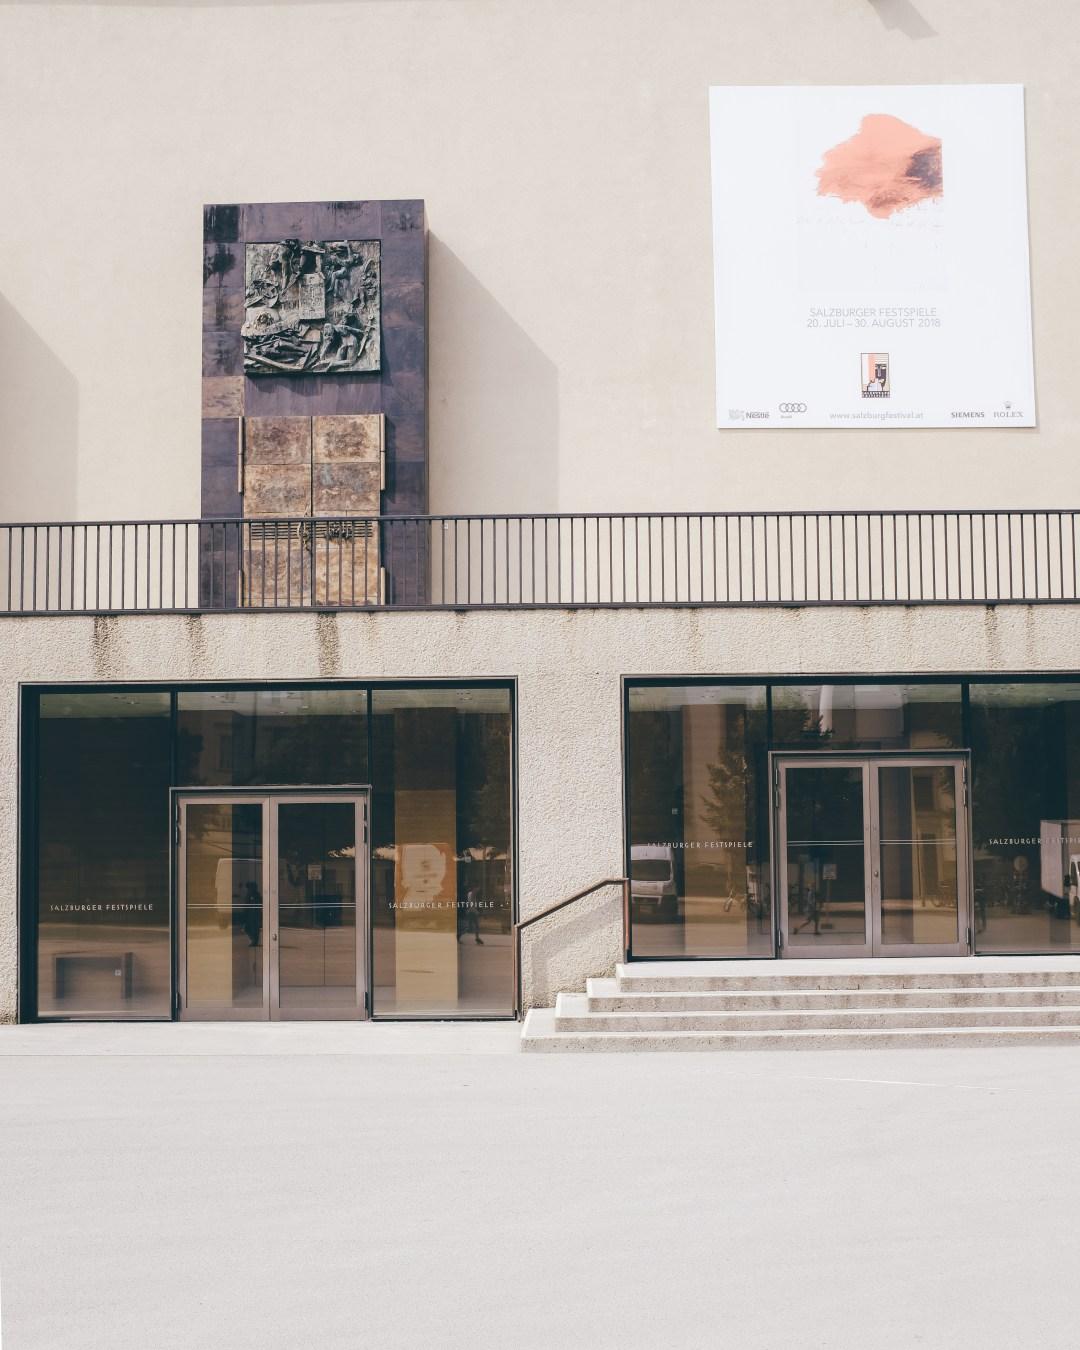 inastil, Ü50Mode, FashionÜ50, Modeberatung, Salzburg, Festspiele, Hose mit Blumenmuster, Seidenshirt, YSL Tasche Envelope, Slingback Pumps, elegant, Sale-9